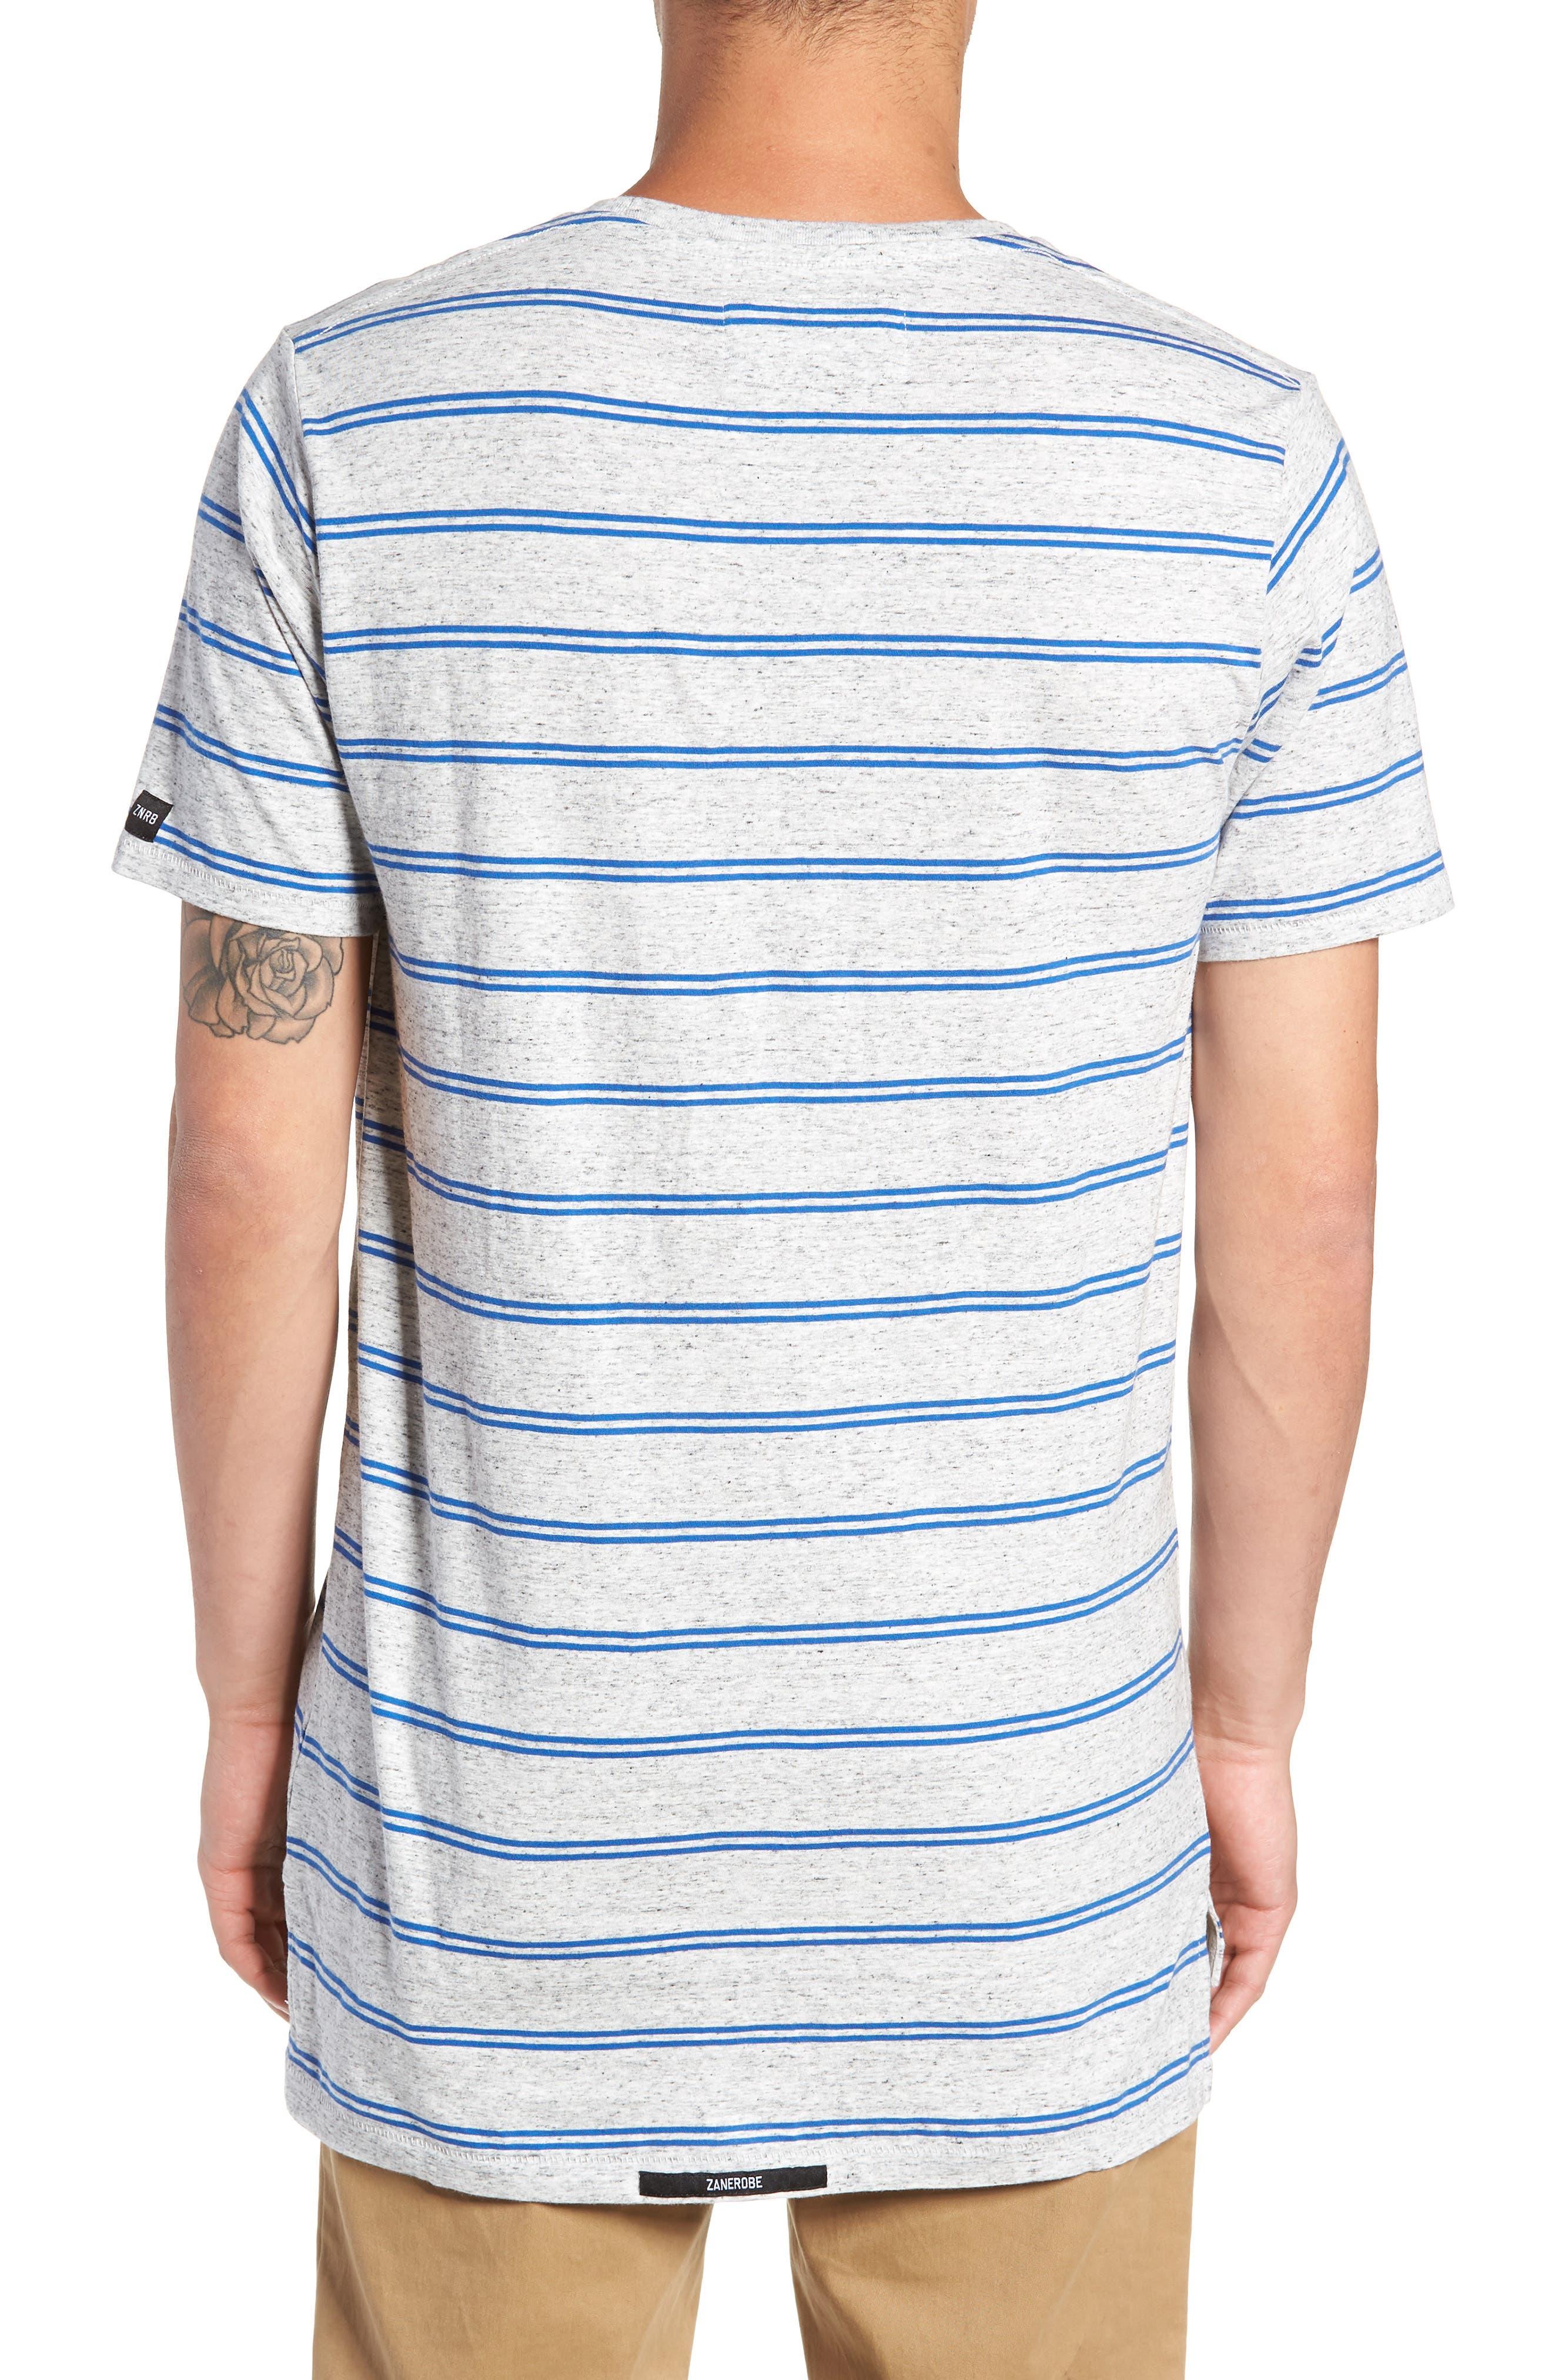 Flintlock T-Shirt,                             Alternate thumbnail 2, color,                             STORM MARLE/ COBALT